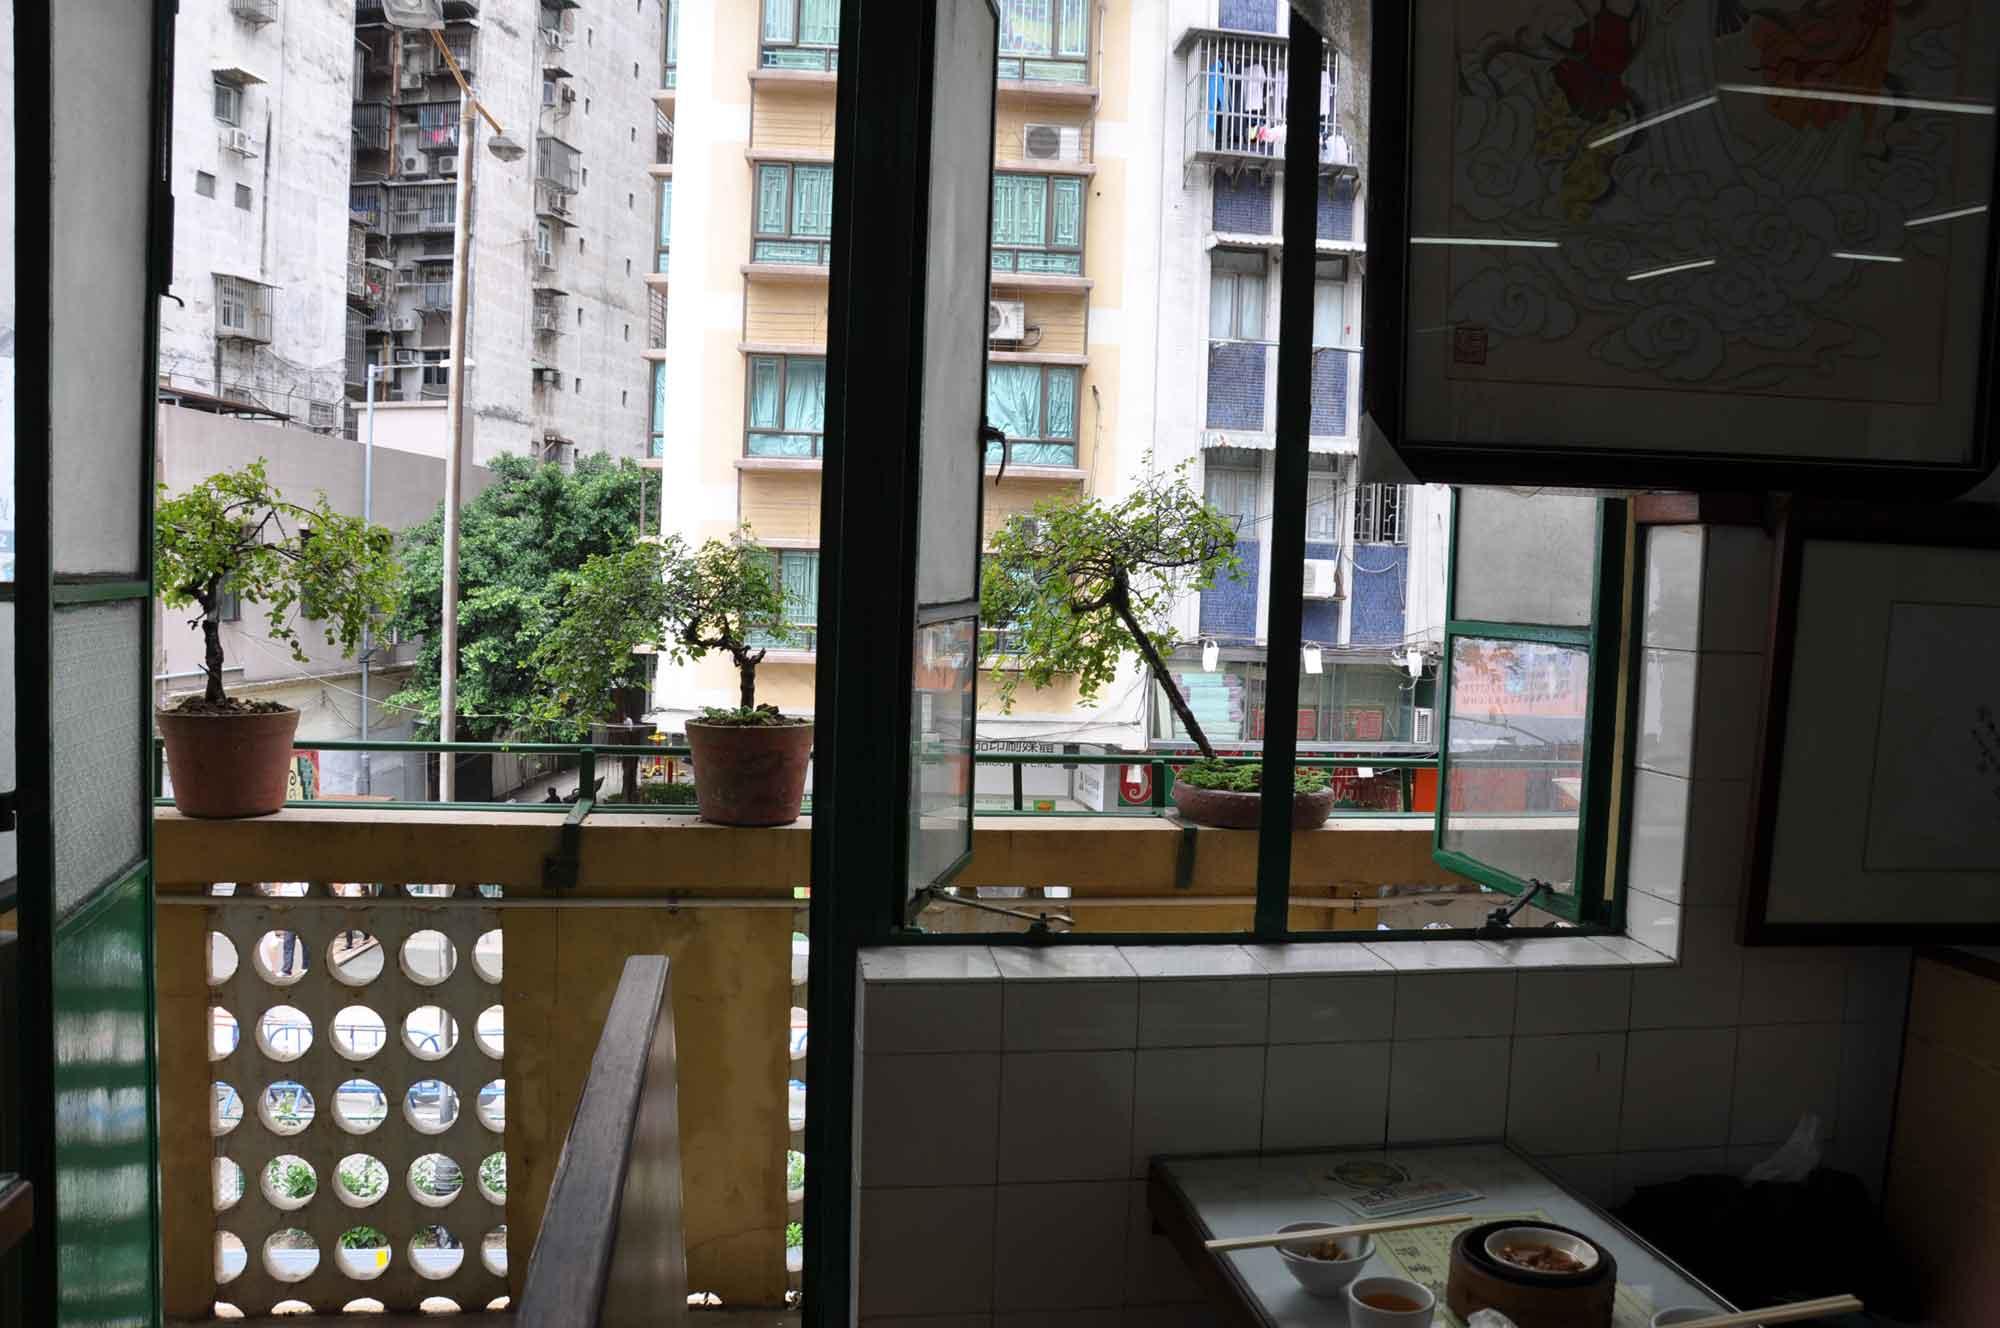 Long Wa Teahouse windows